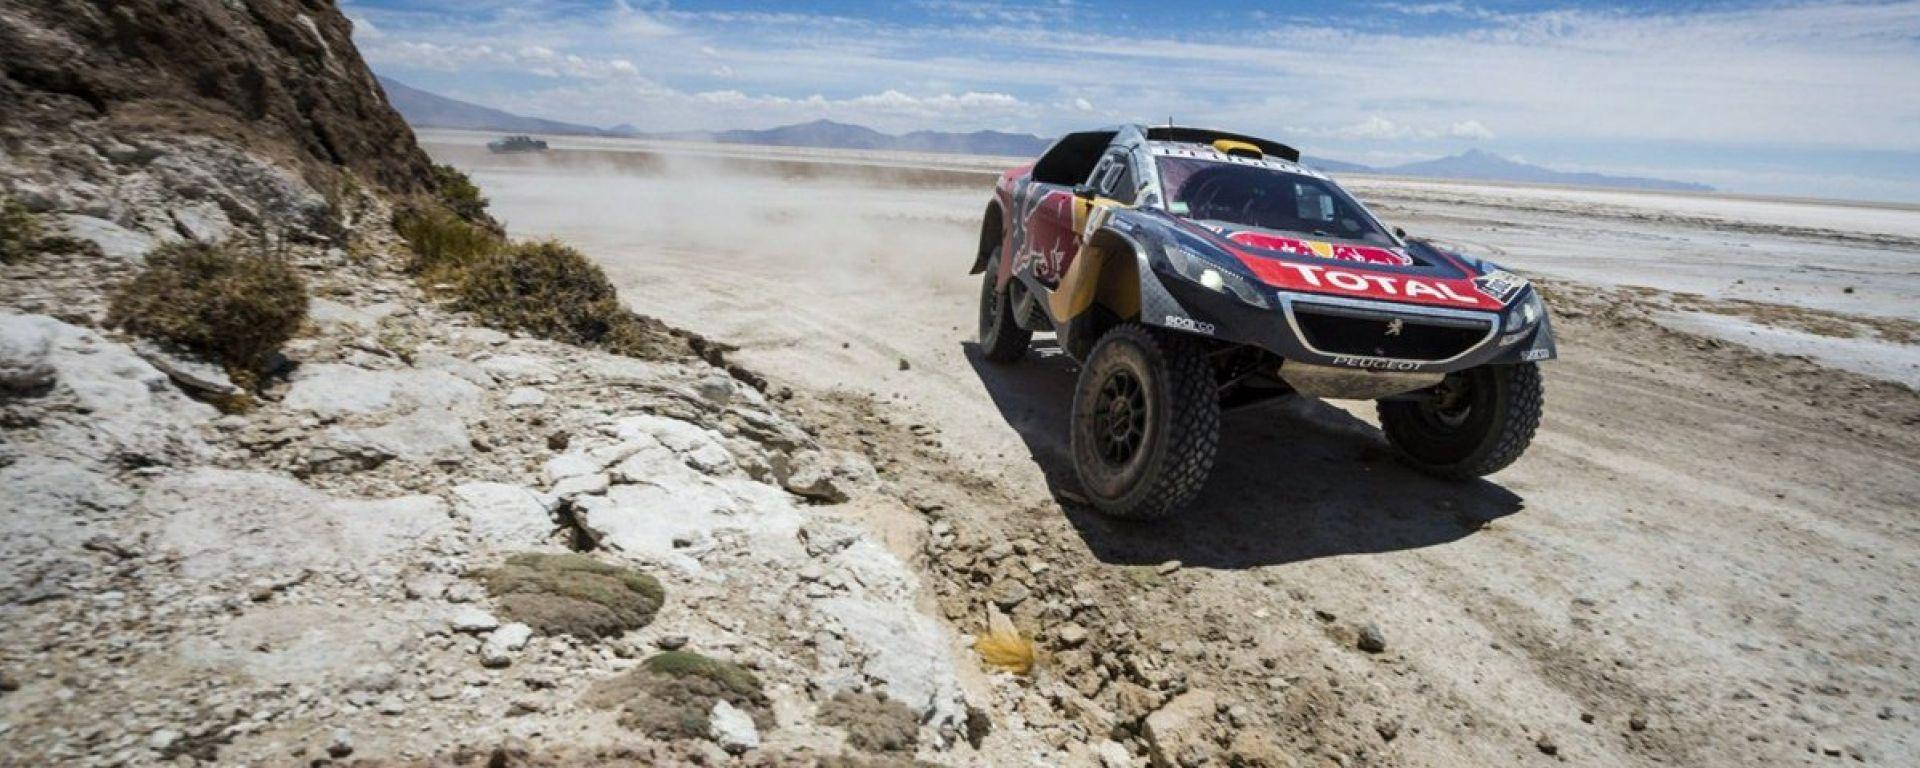 Silk Way Rally 2016 - Peugeot 2008 DKR